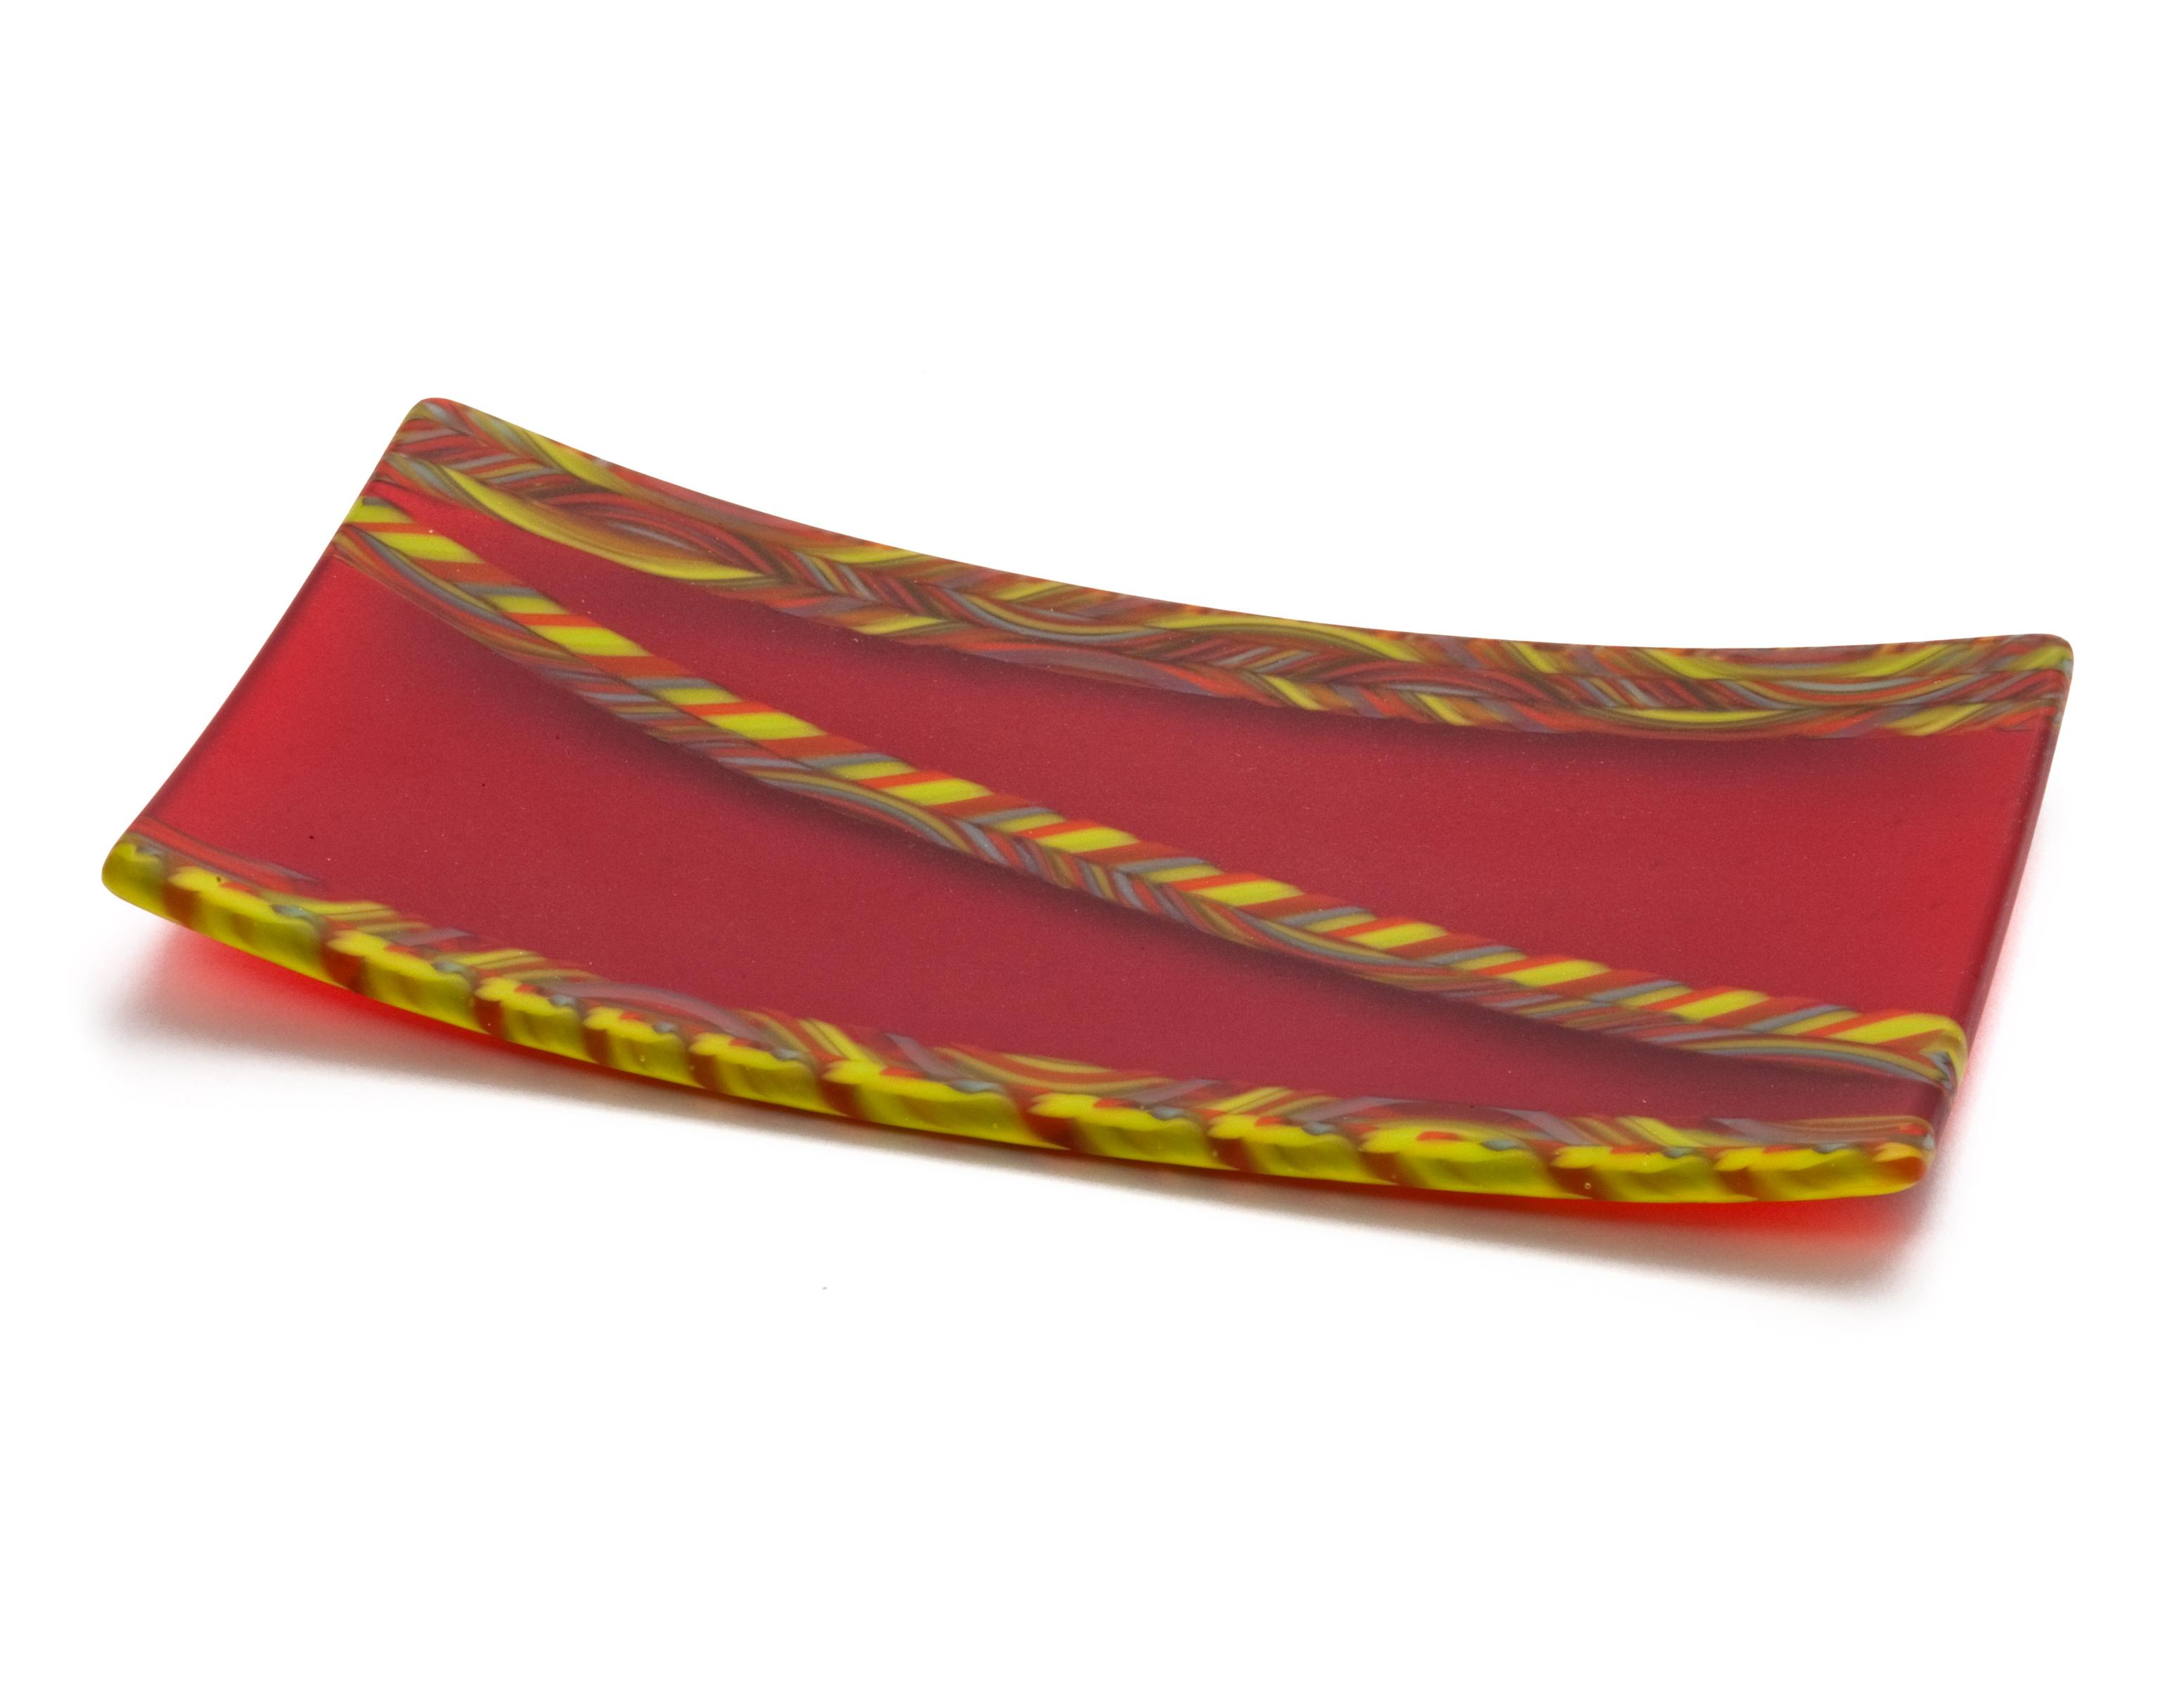 Orange Cane Plate